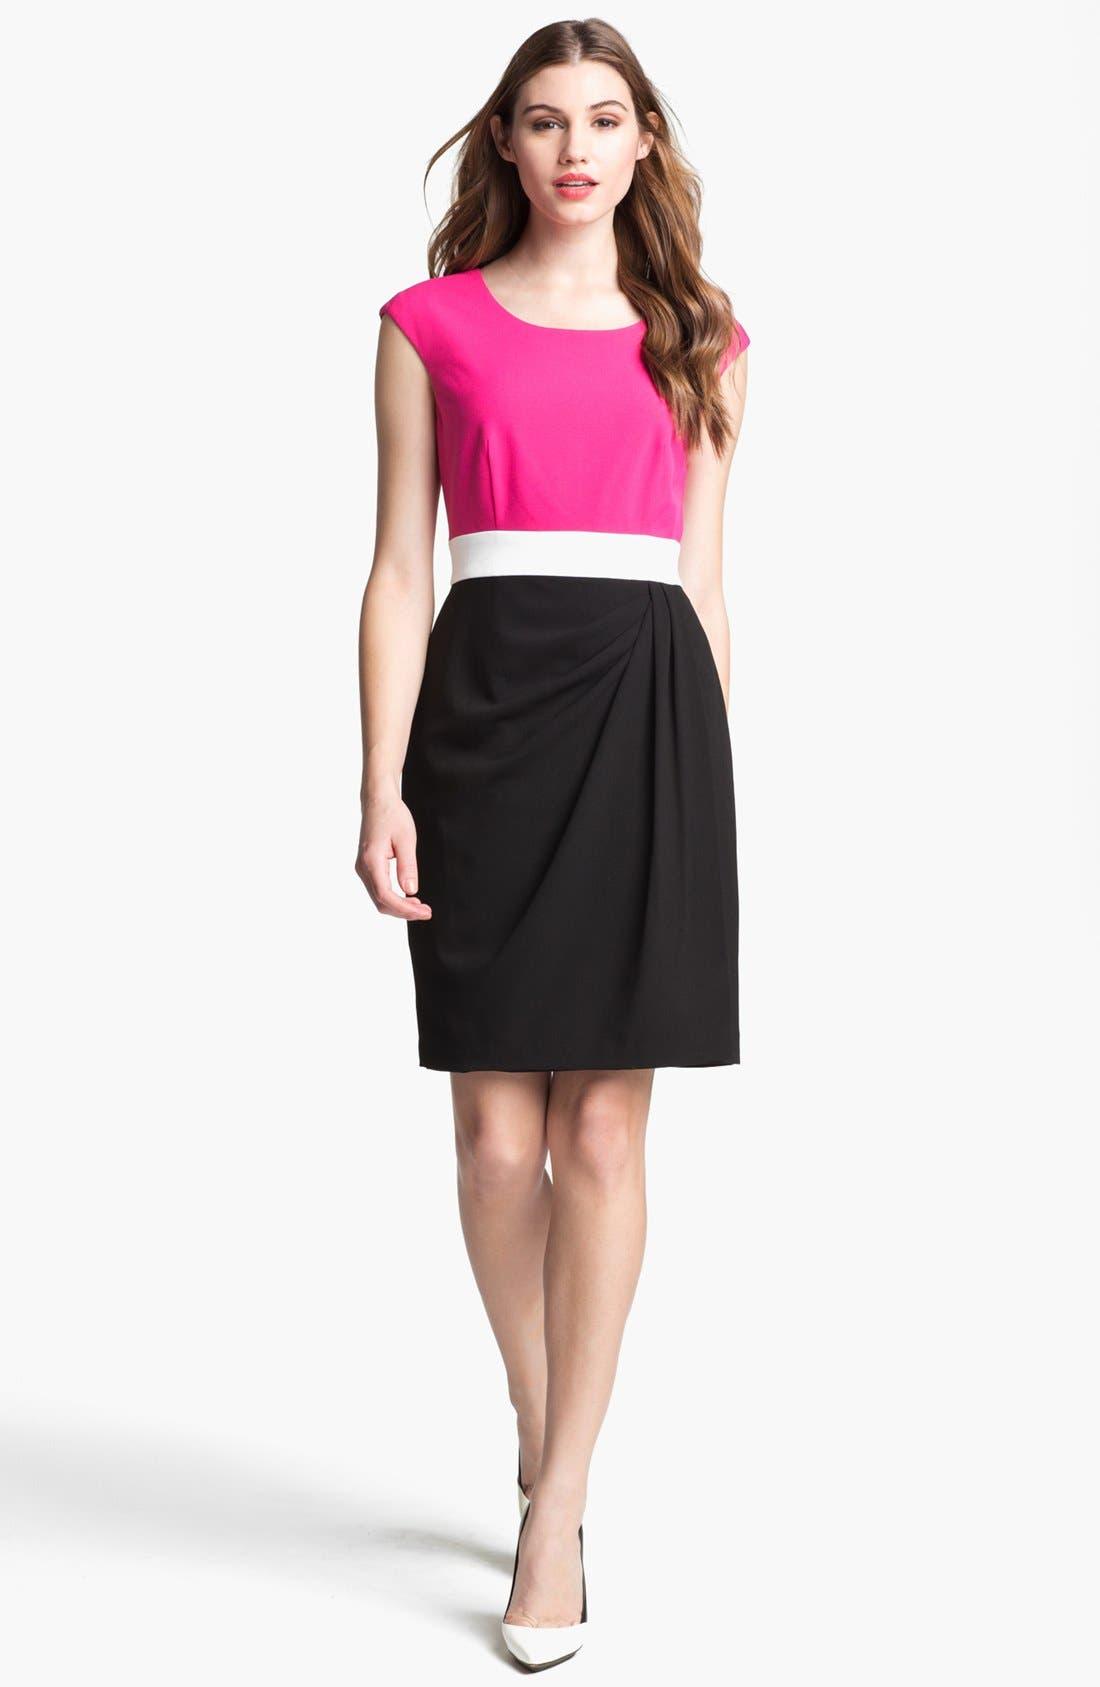 Alternate Image 1 Selected - Calvin Klein Colorblock Side Drape Sheath Dress (Petite)